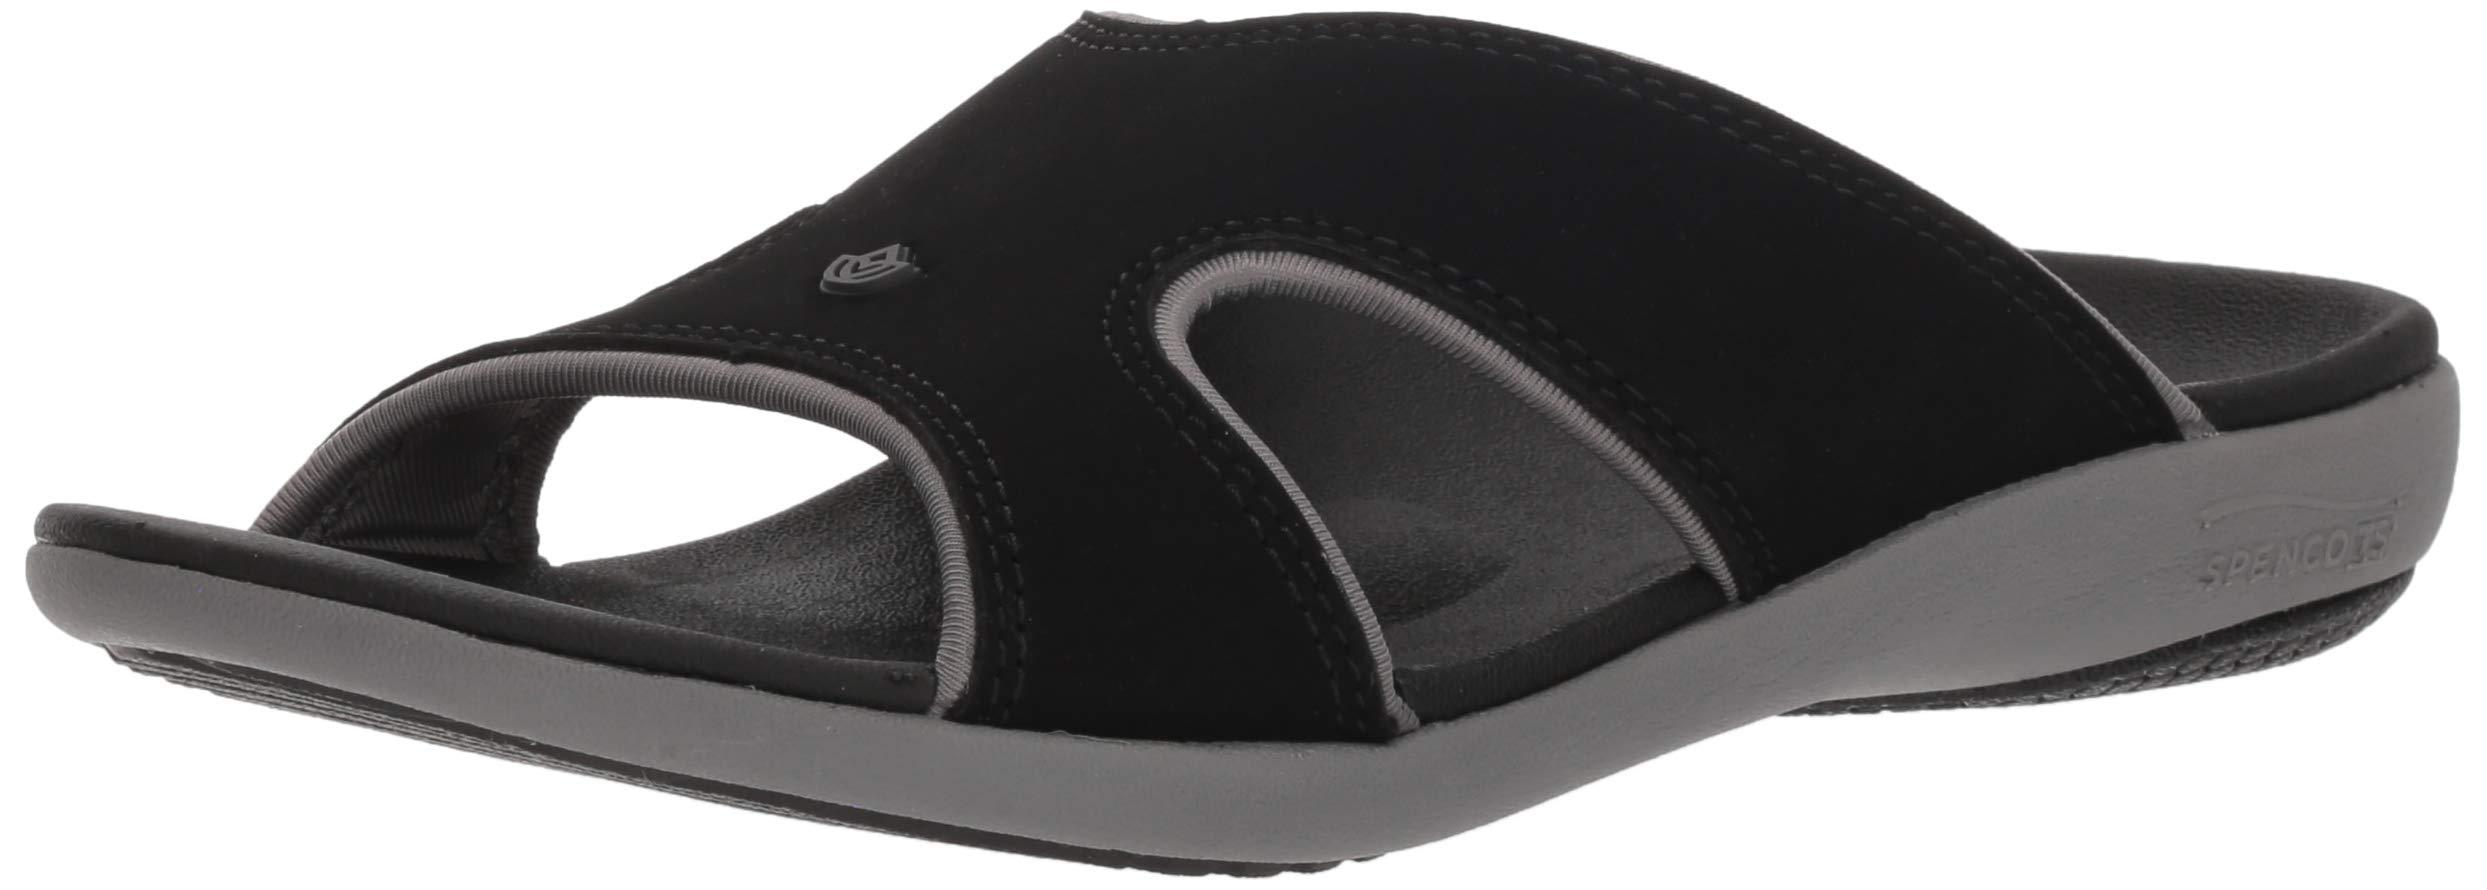 Spenco Women Kholo Plus Slide Sandal, Onyx, 9 Medium US